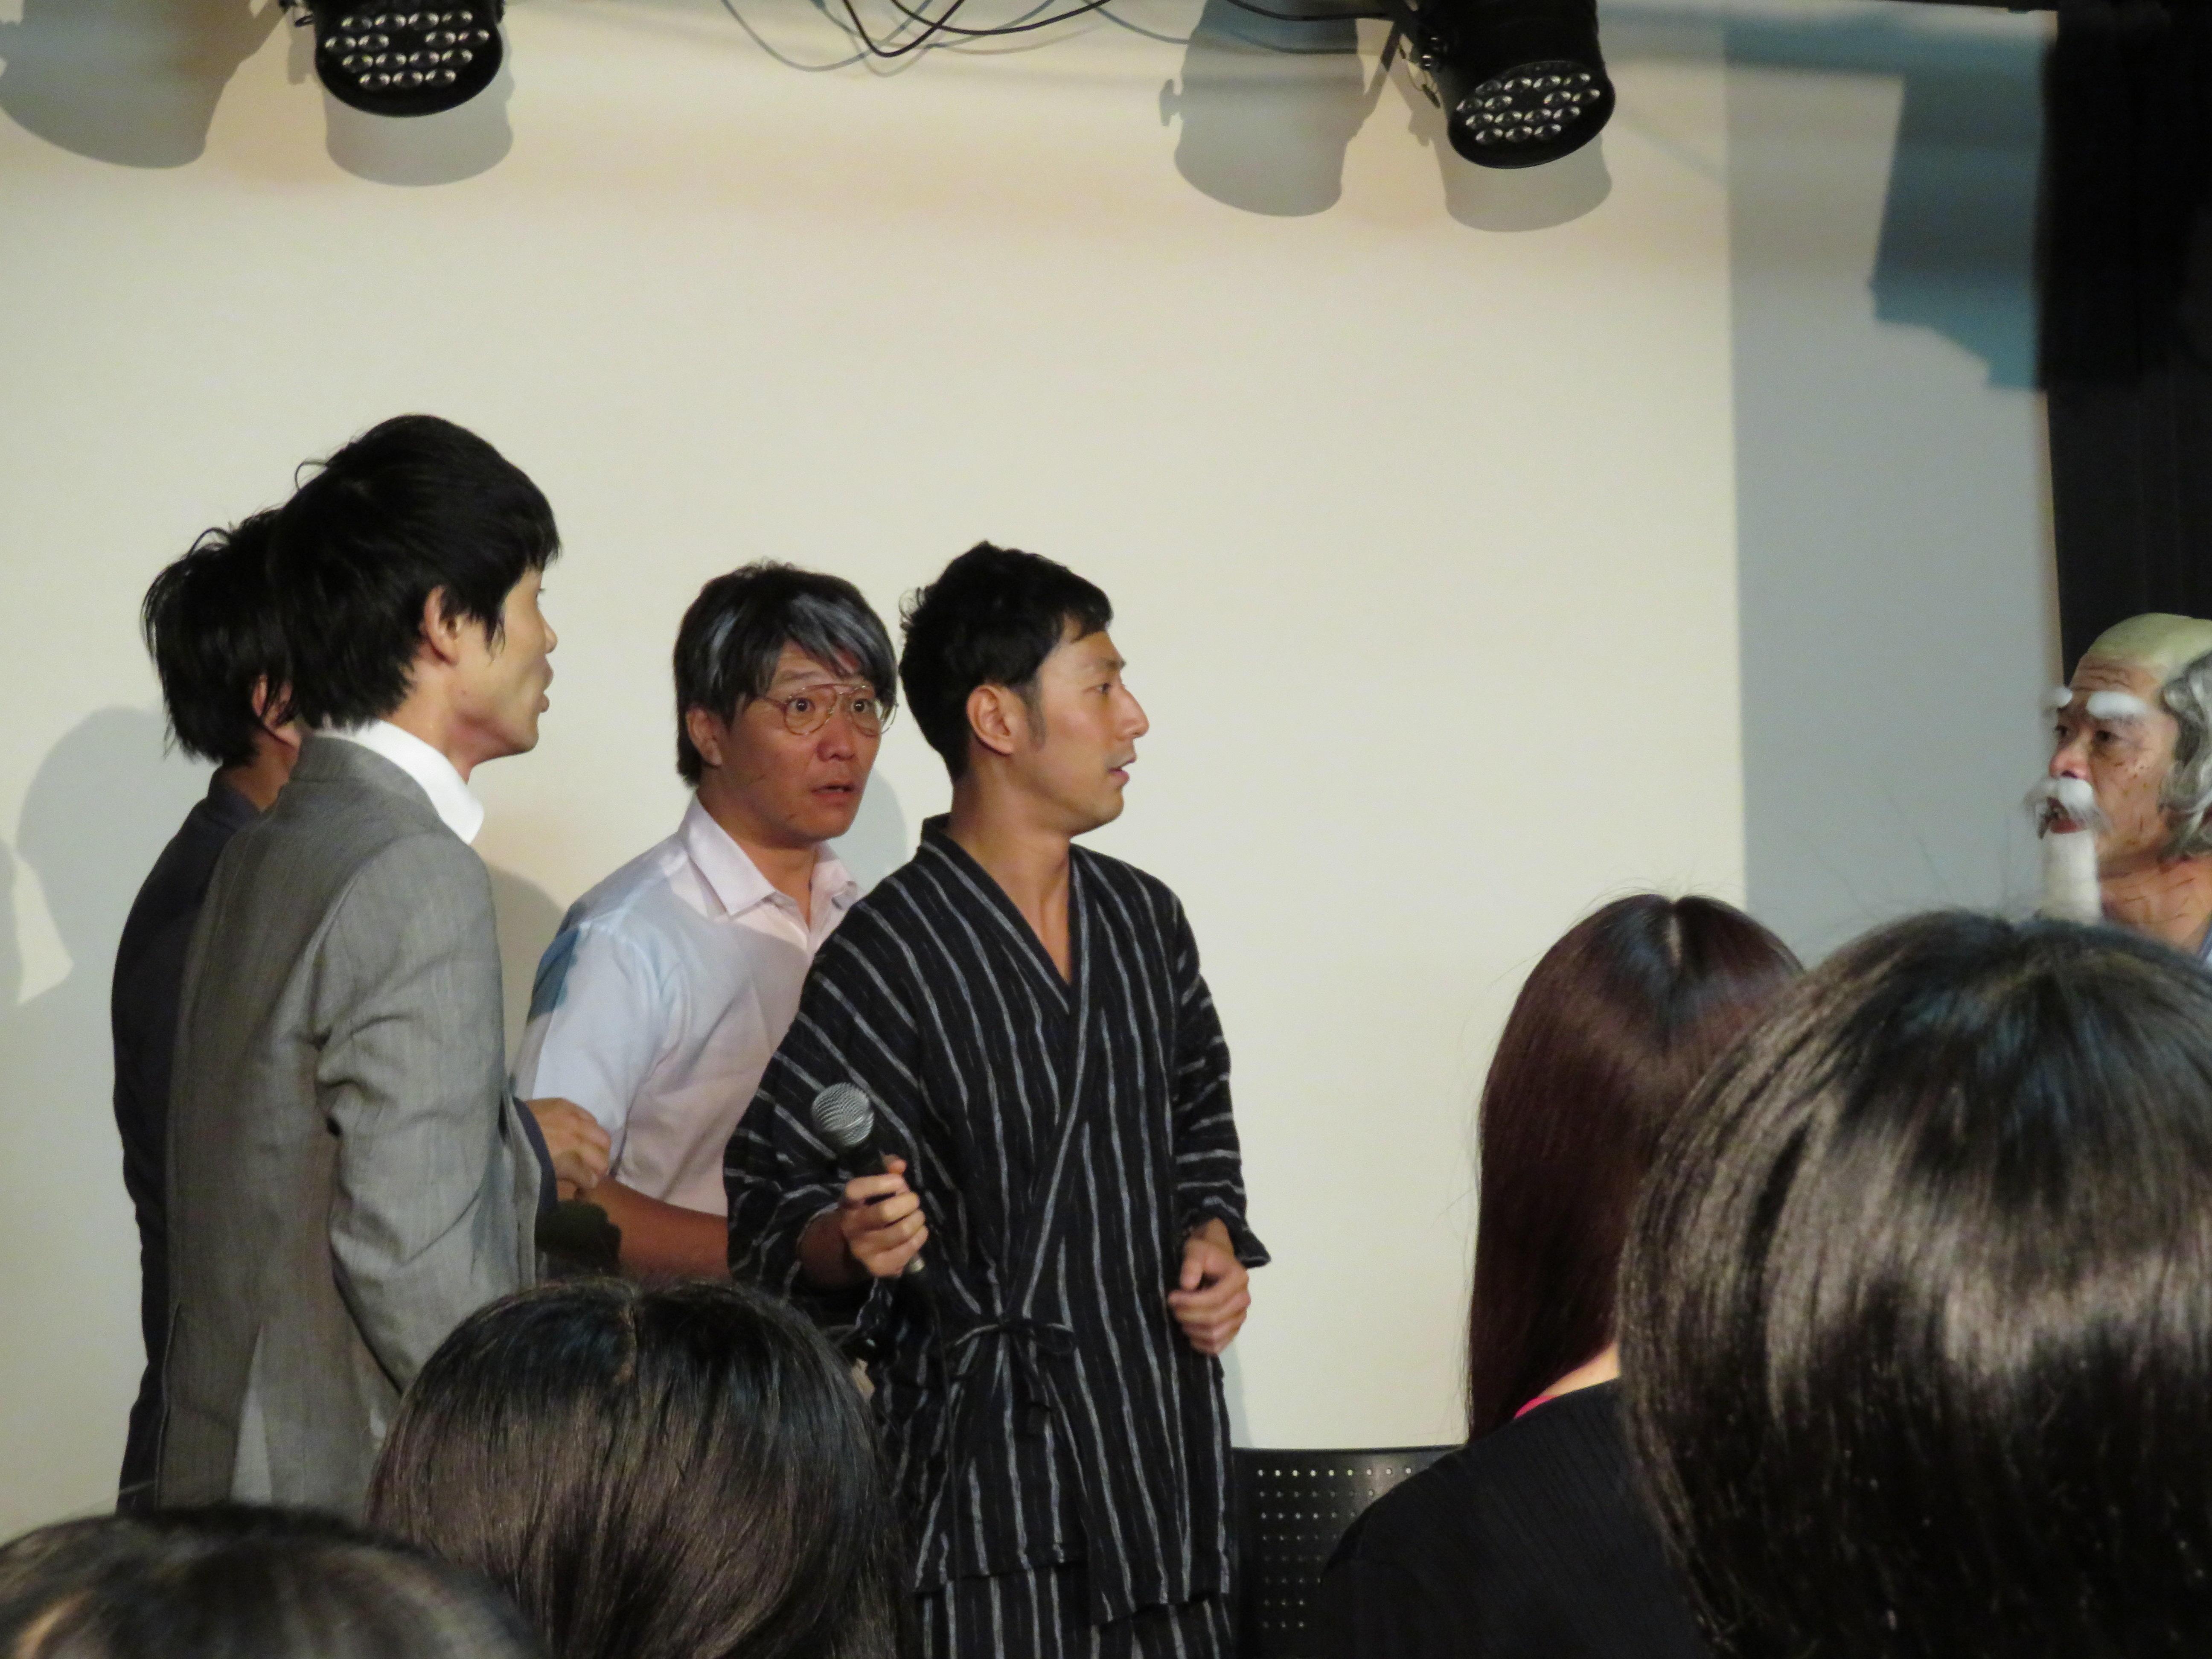 http://news.yoshimoto.co.jp/20170830125458-d3393a5cb029dc5222f910427369dd8f34671e4d.jpg